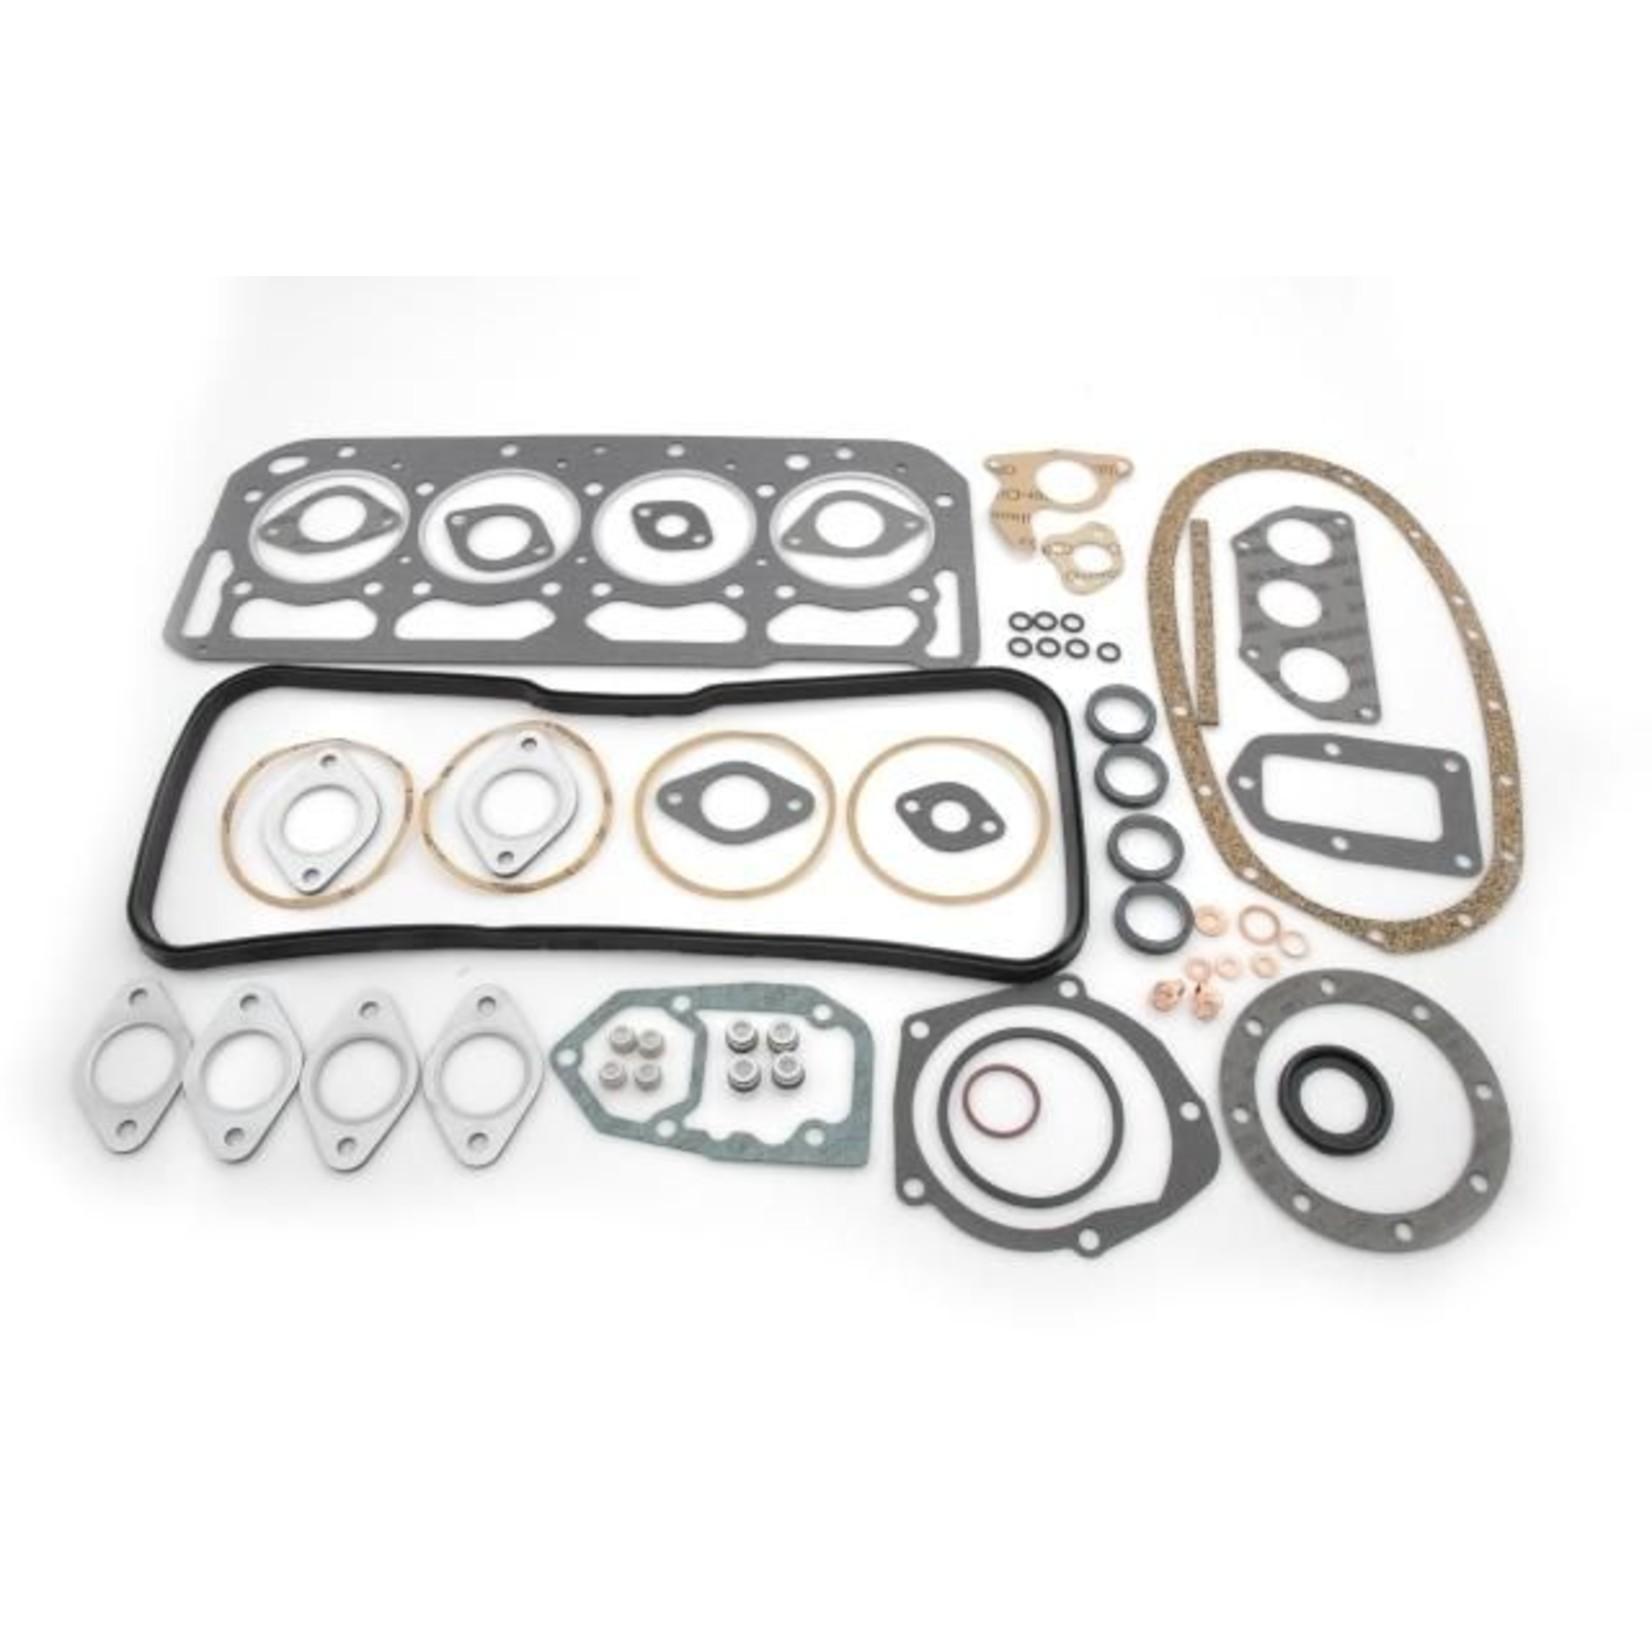 Motorpakkingset DS21 / ID21 / D super 5 Nr Org: ZC9000278U